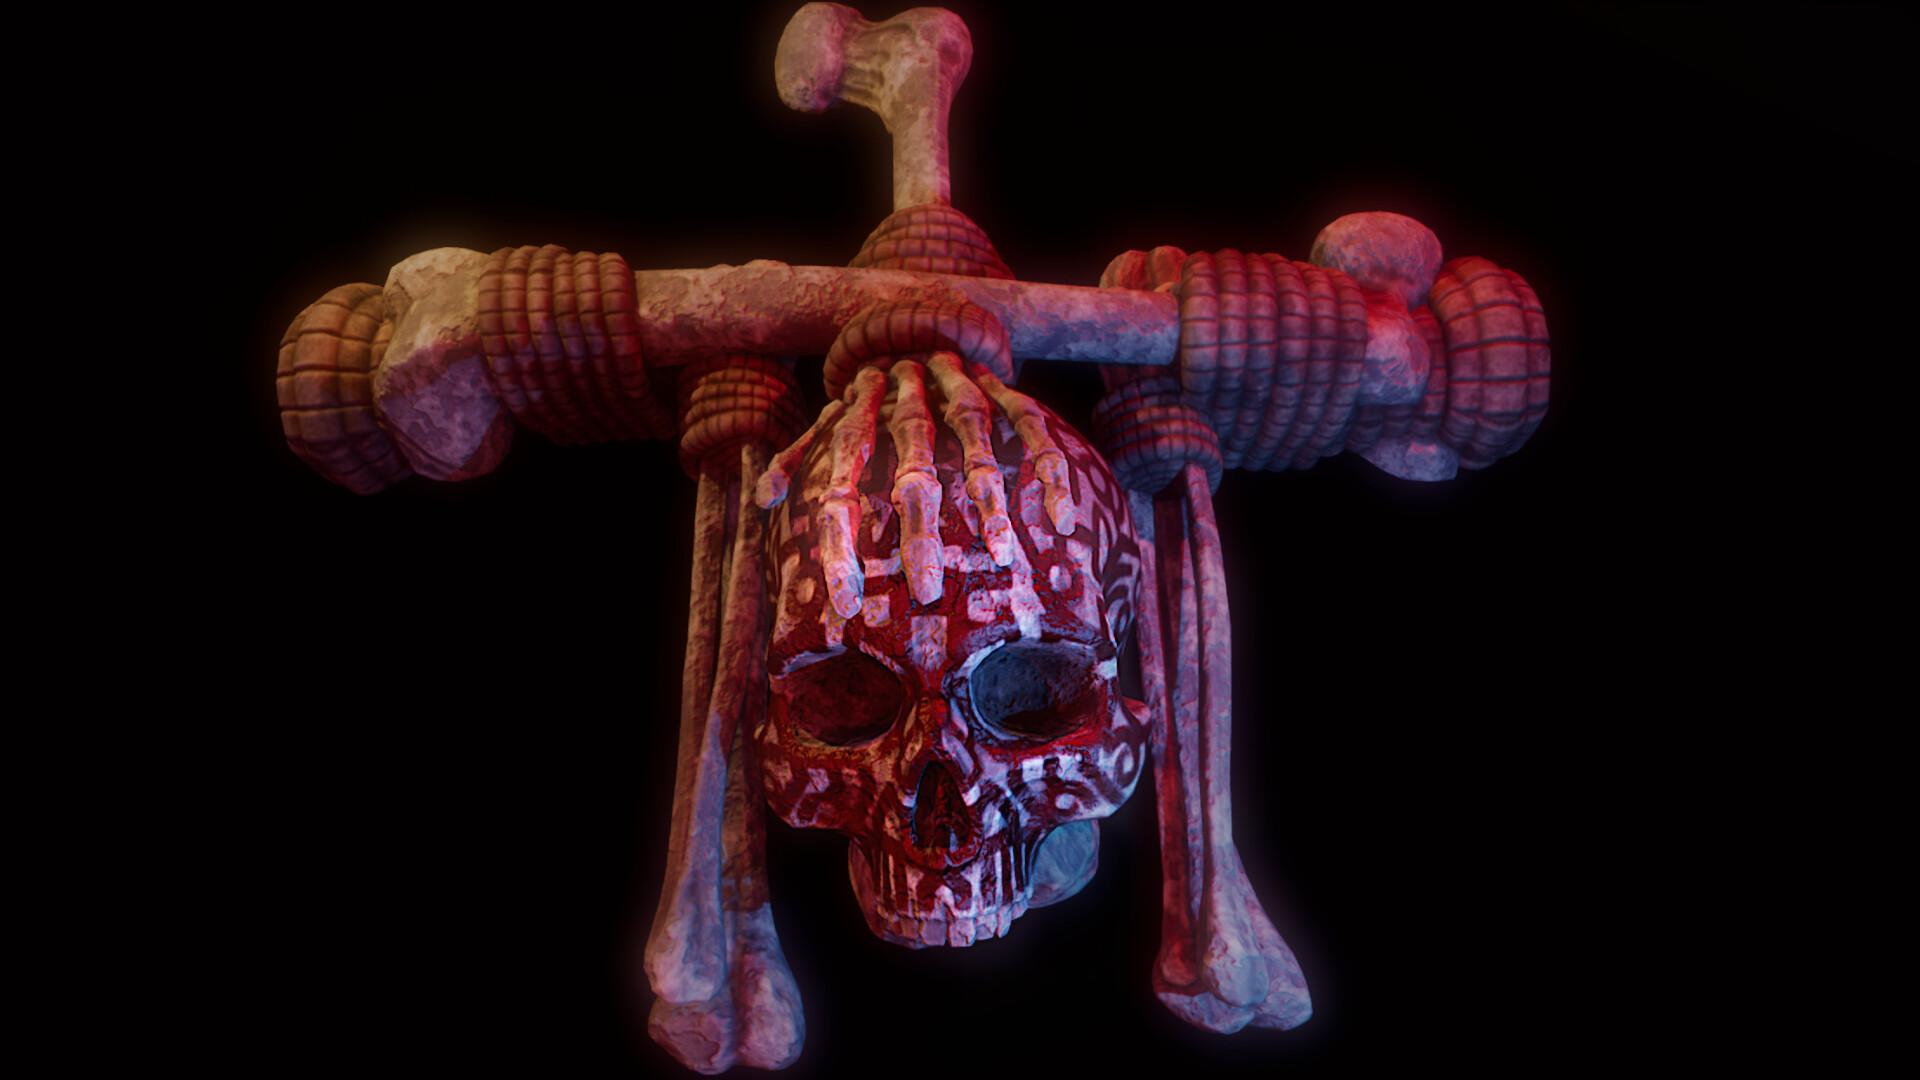 gareth-sibson-2019-skulls-gareth-sibson-